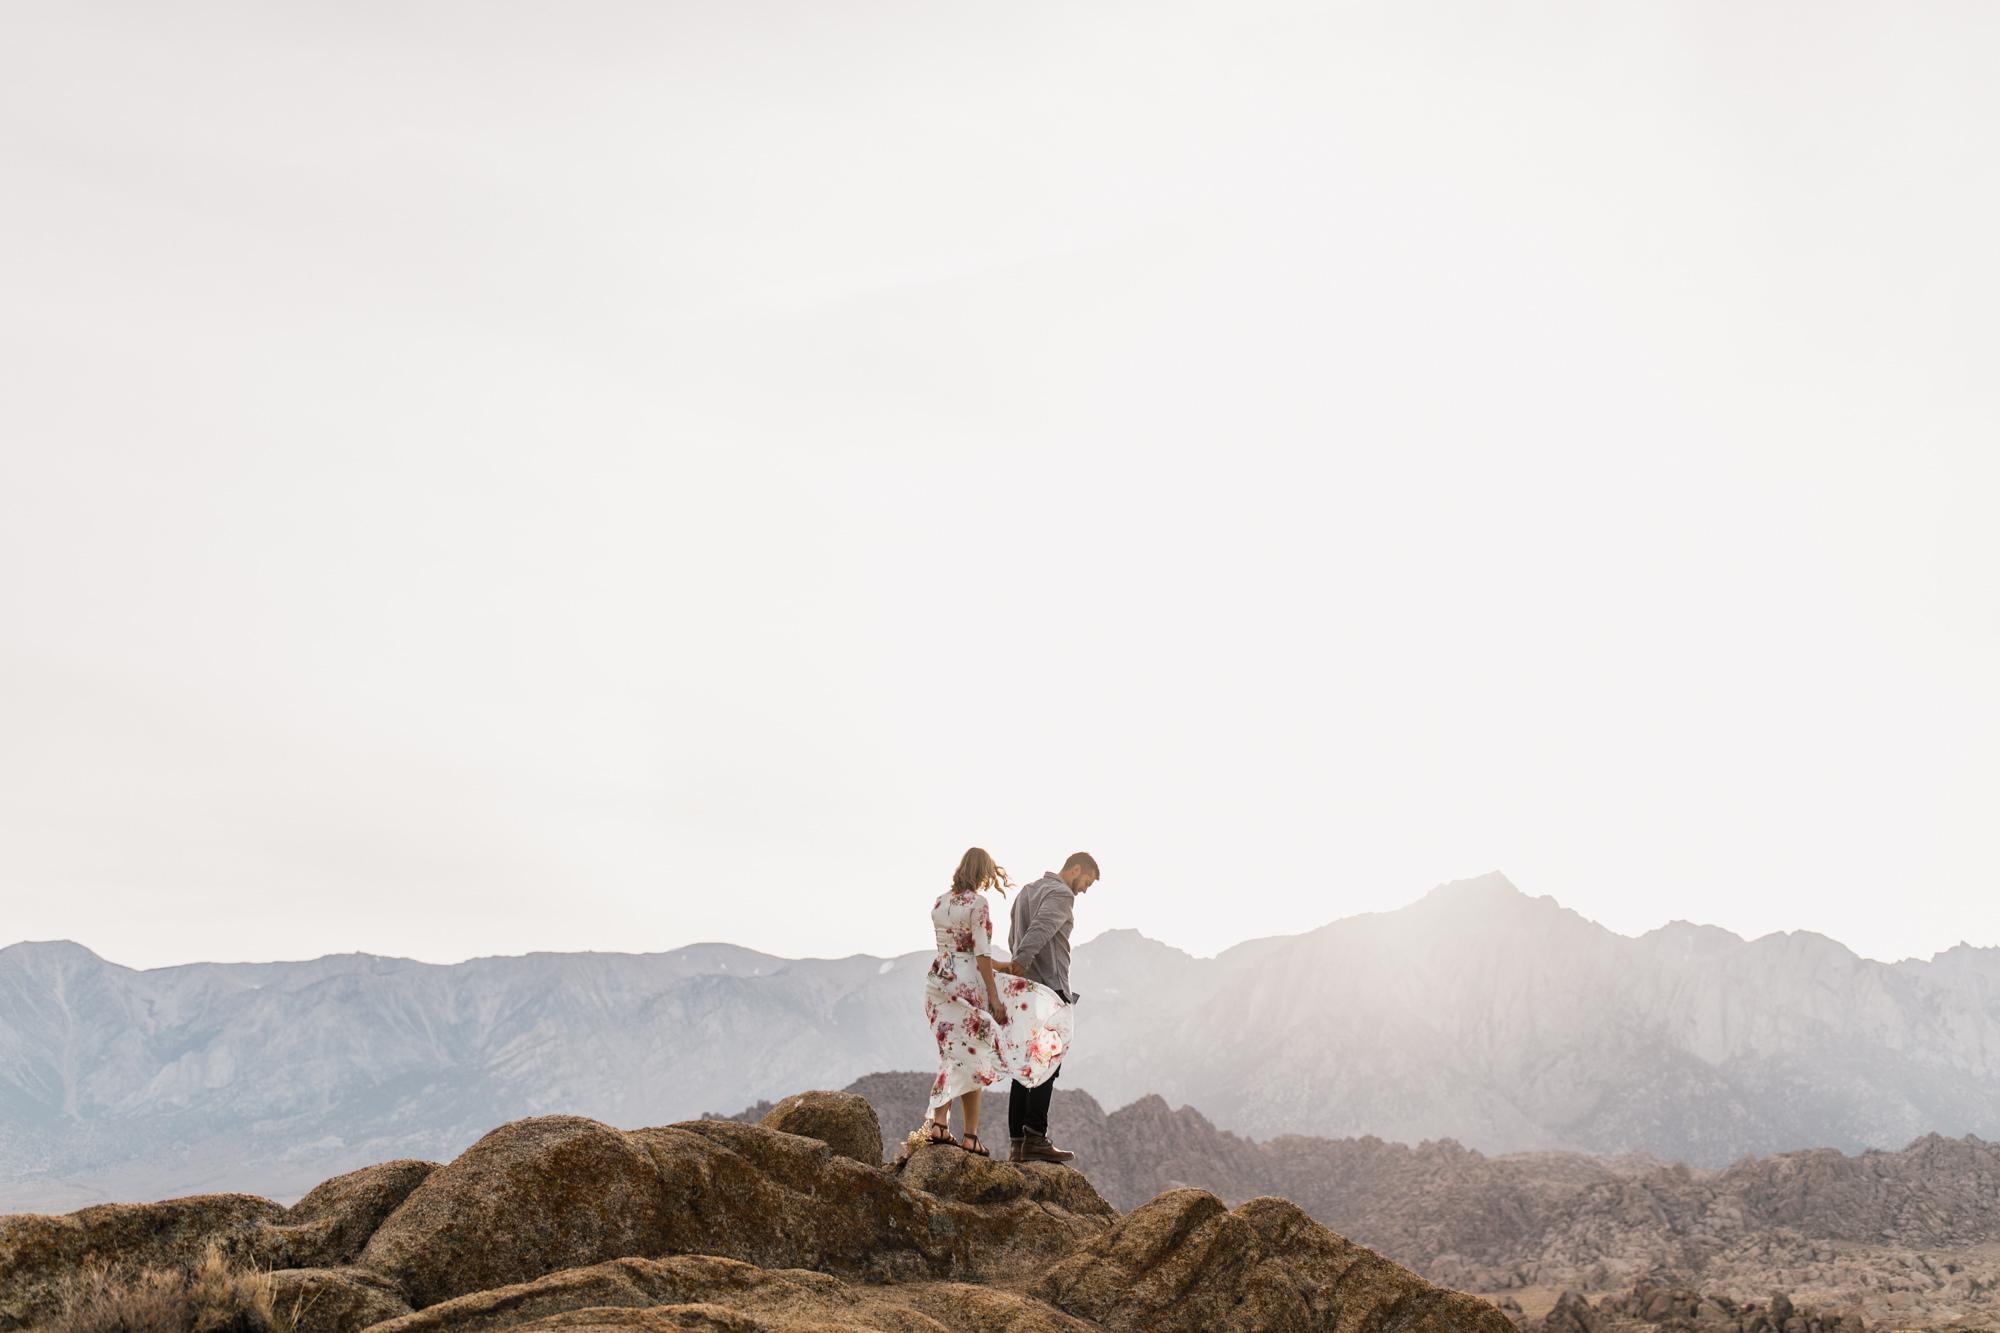 hannah + jason's adventurous camp siteengagement session | van life in the eastern sierra |california adventure elopement photographer | the hearnes adventure photography | www.thehearnes.com